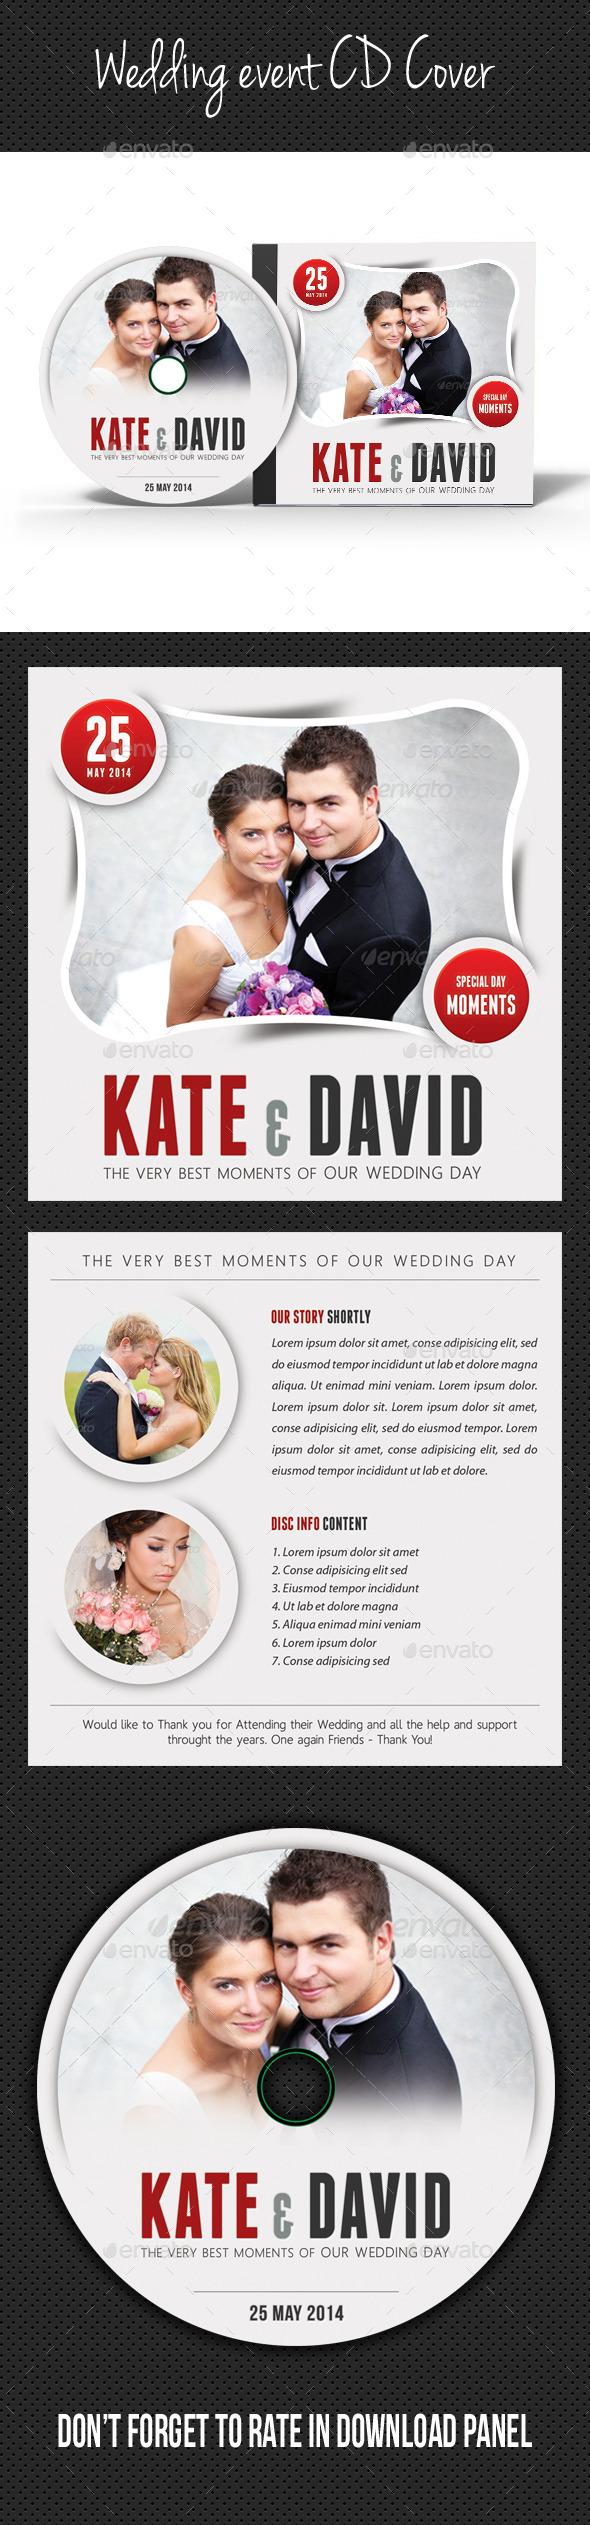 Wedding Event CD Cover V02 - CD & DVD Artwork Print Templates